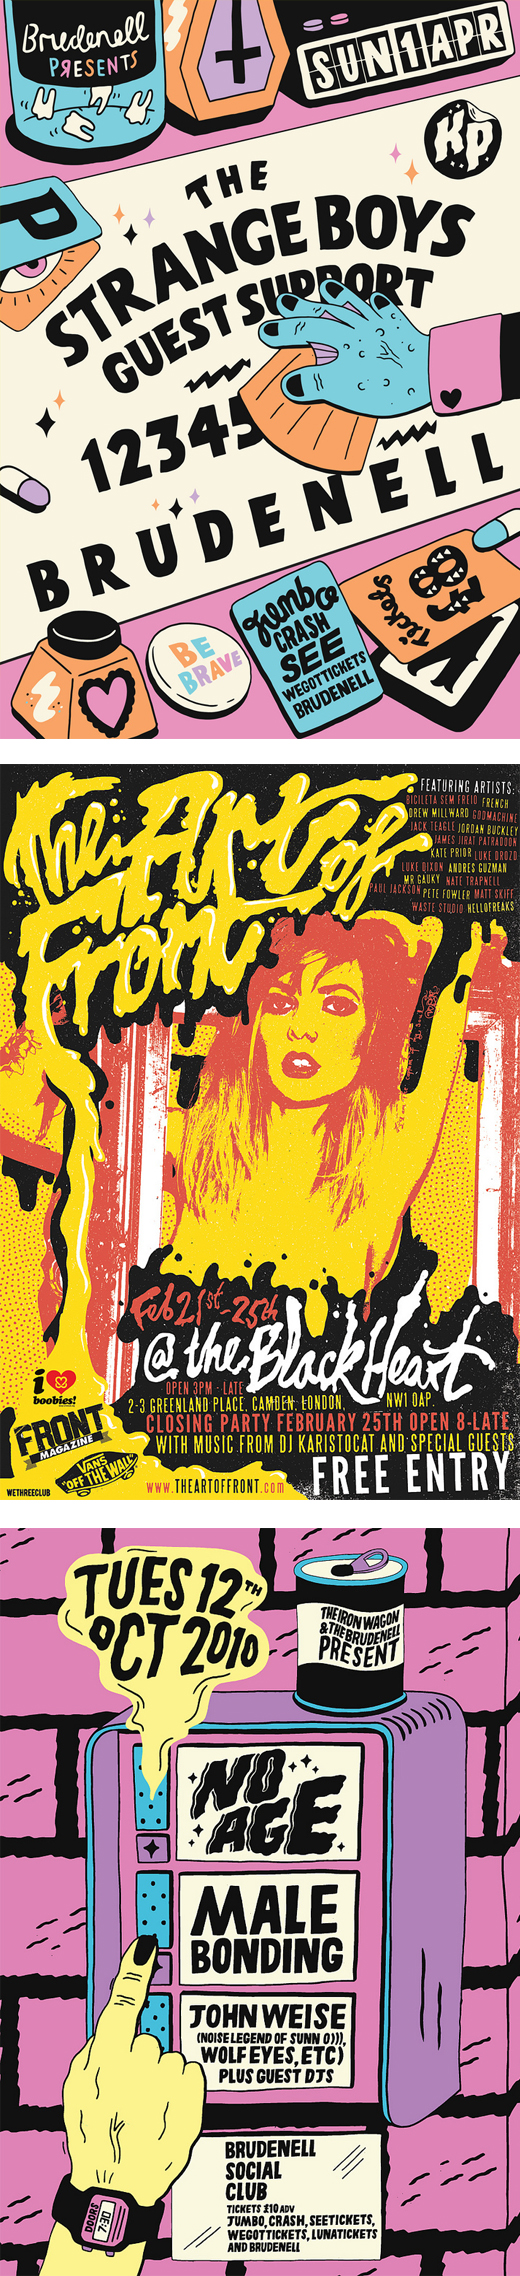 rad gig poster designs